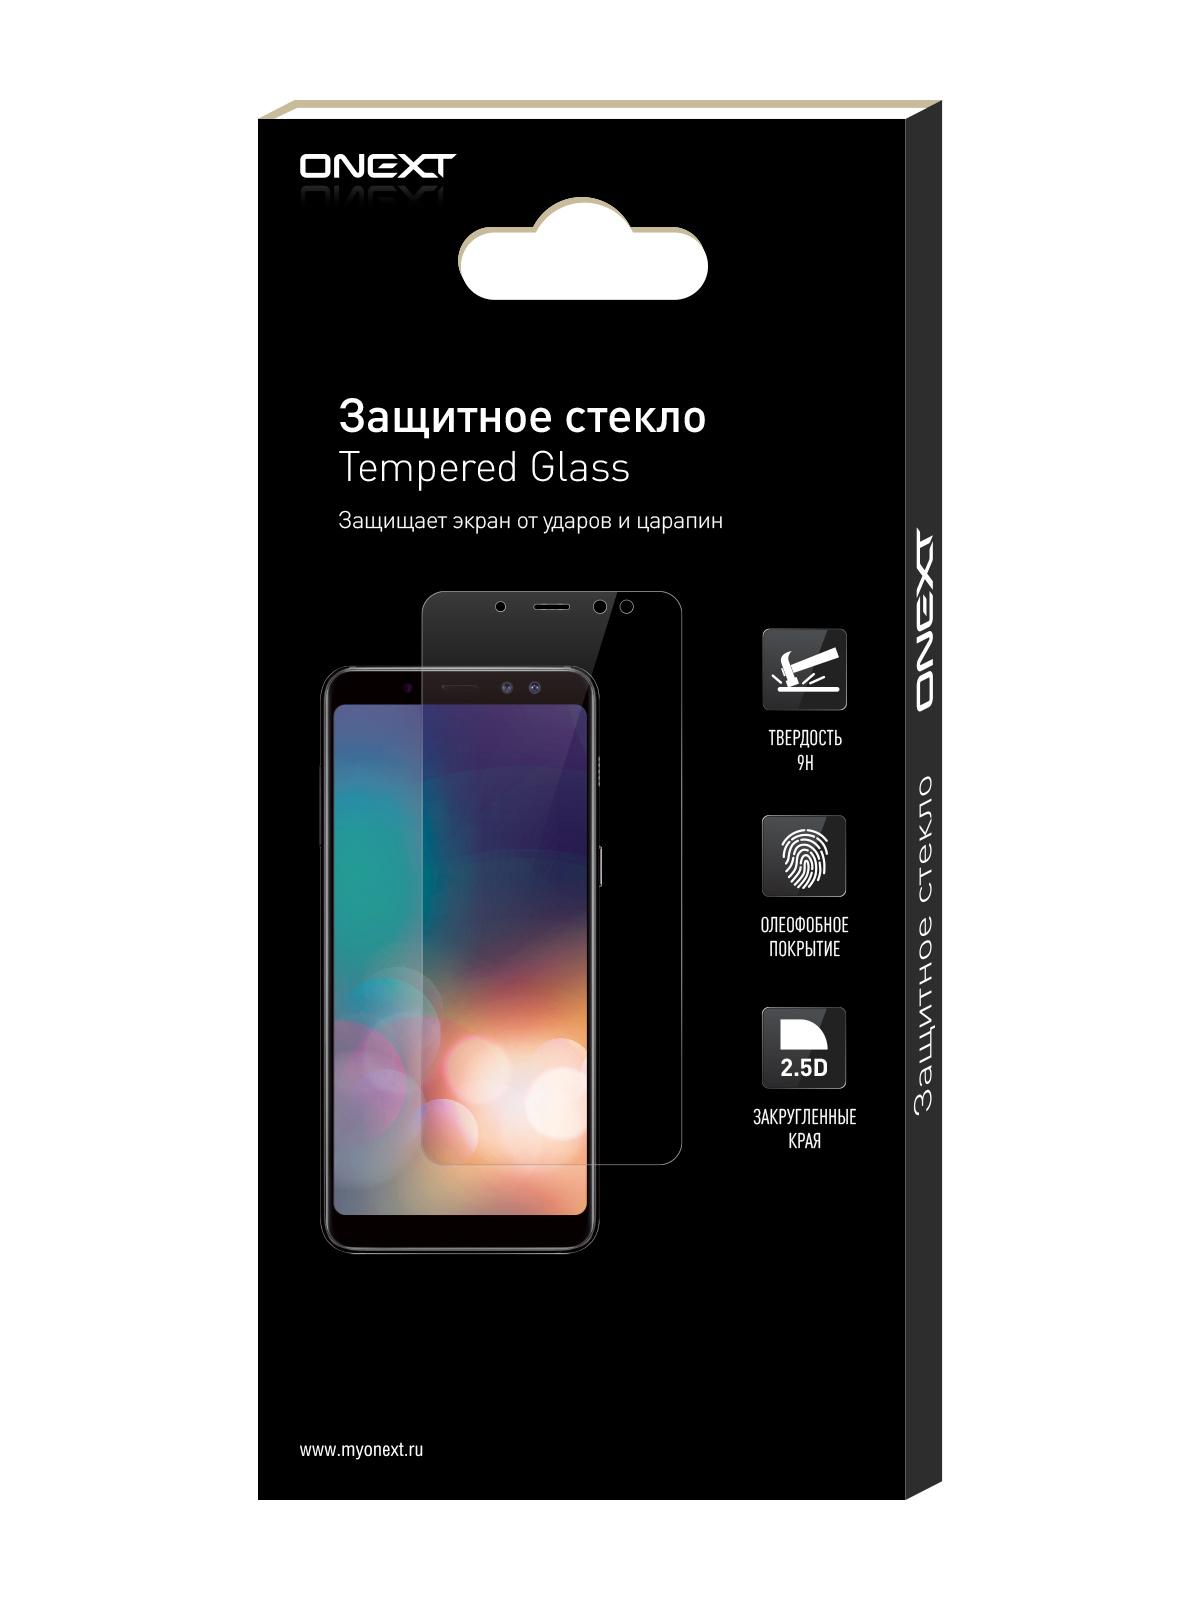 Защитное стекло ONEXT Fly FS505 Nimbus 7 аккумулятор для телефона craftmann bl6424 для fly fs505 nimbus 7 senseit a109 305878ar prestigio wize n3 psp3507 duo